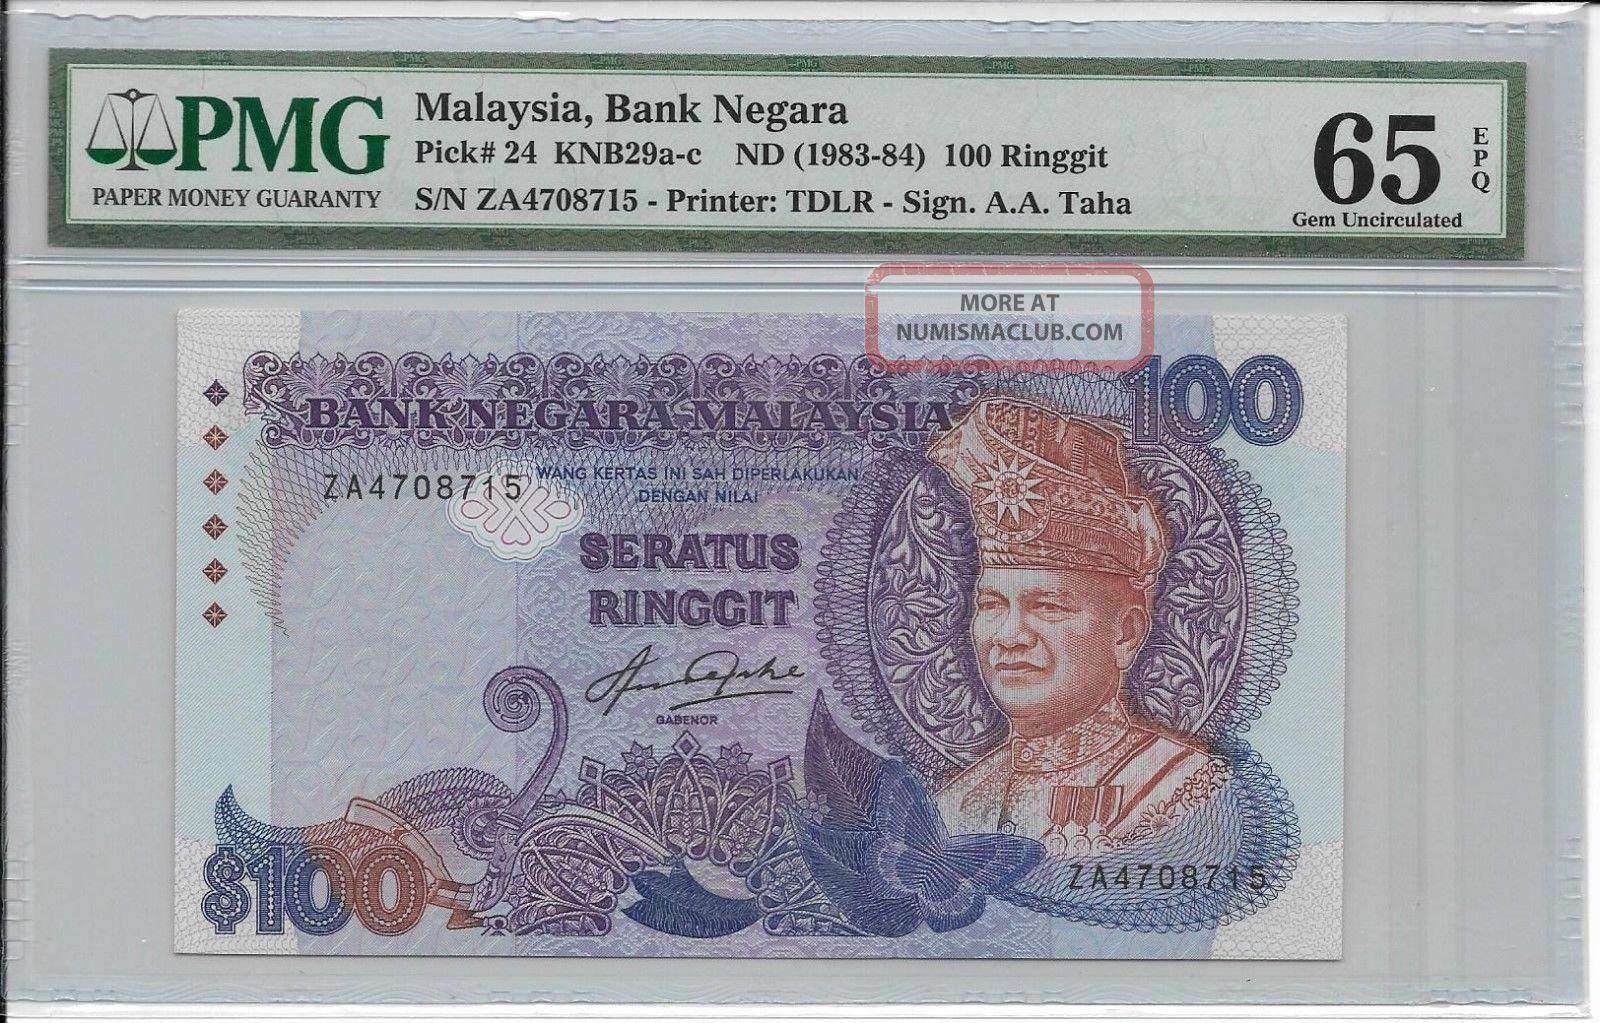 Malaysia,  Bank Negara - 100 Ringgit,  Nd (1983 - 84).  Pmg 65epq.  Blindman Issued. Asia photo